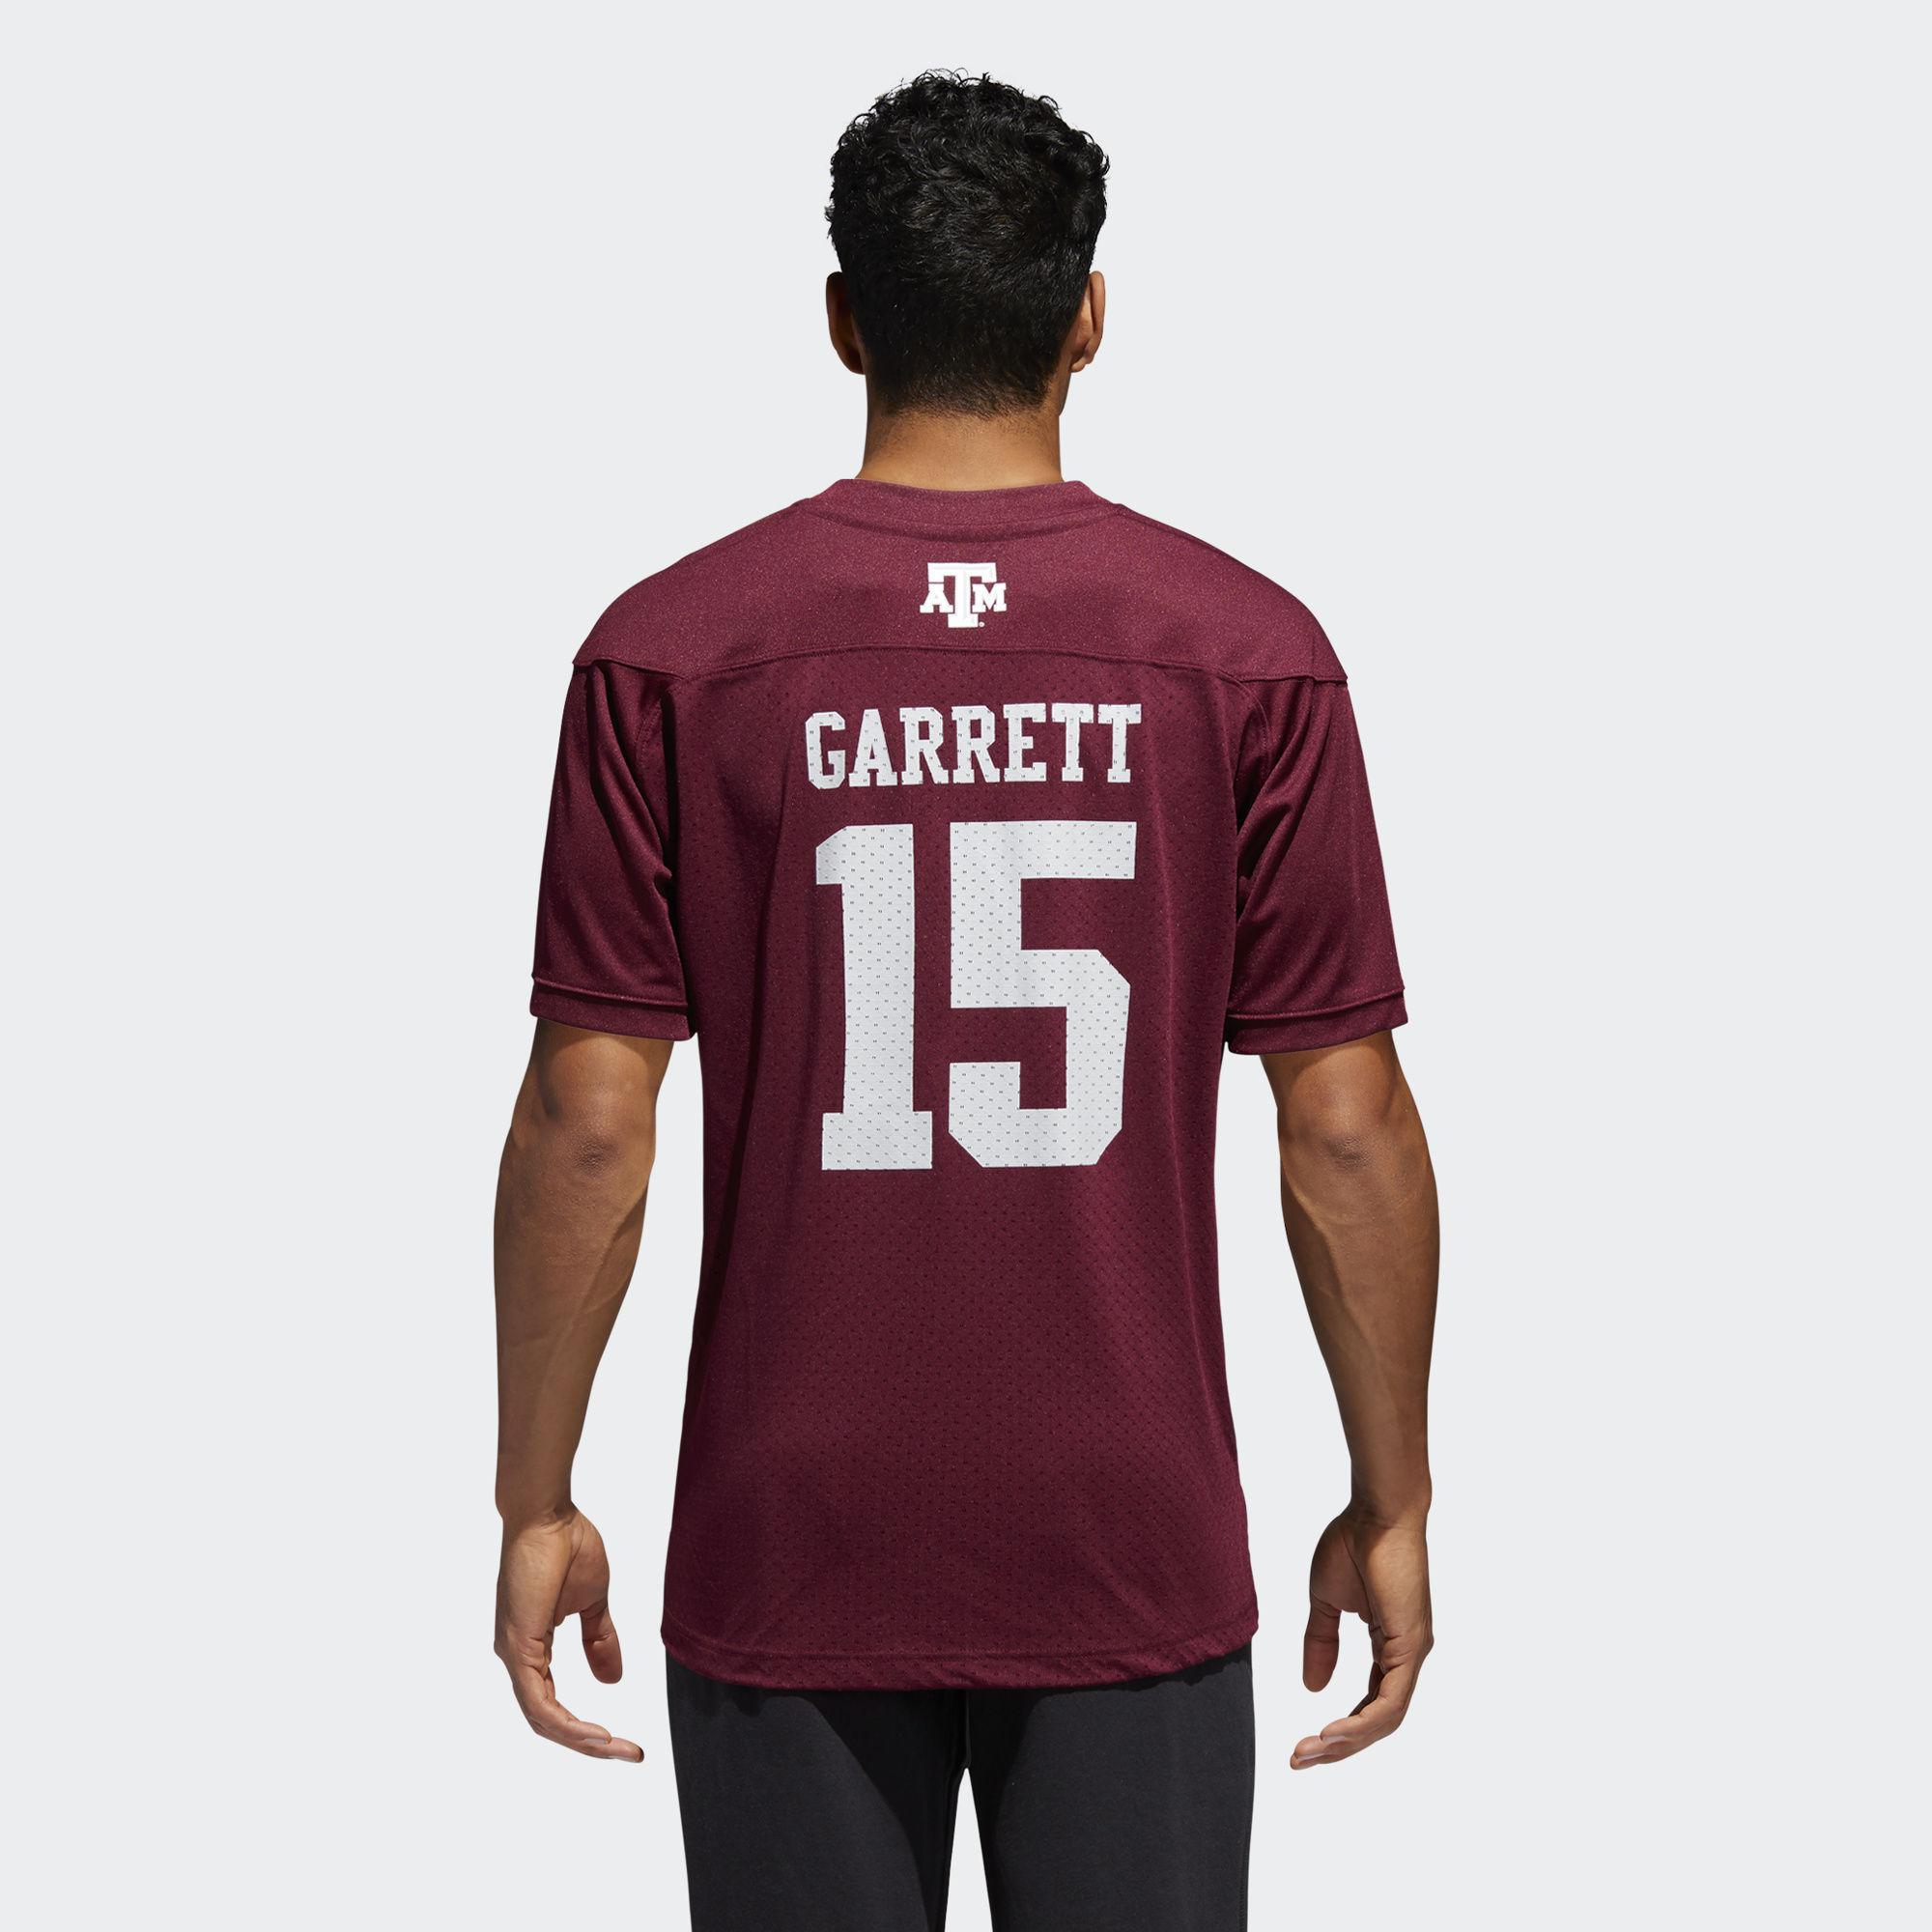 cheap for discount 80ed2 a8d98 Adidas White Aggies Myles Garrett Replica Football Jersey for men